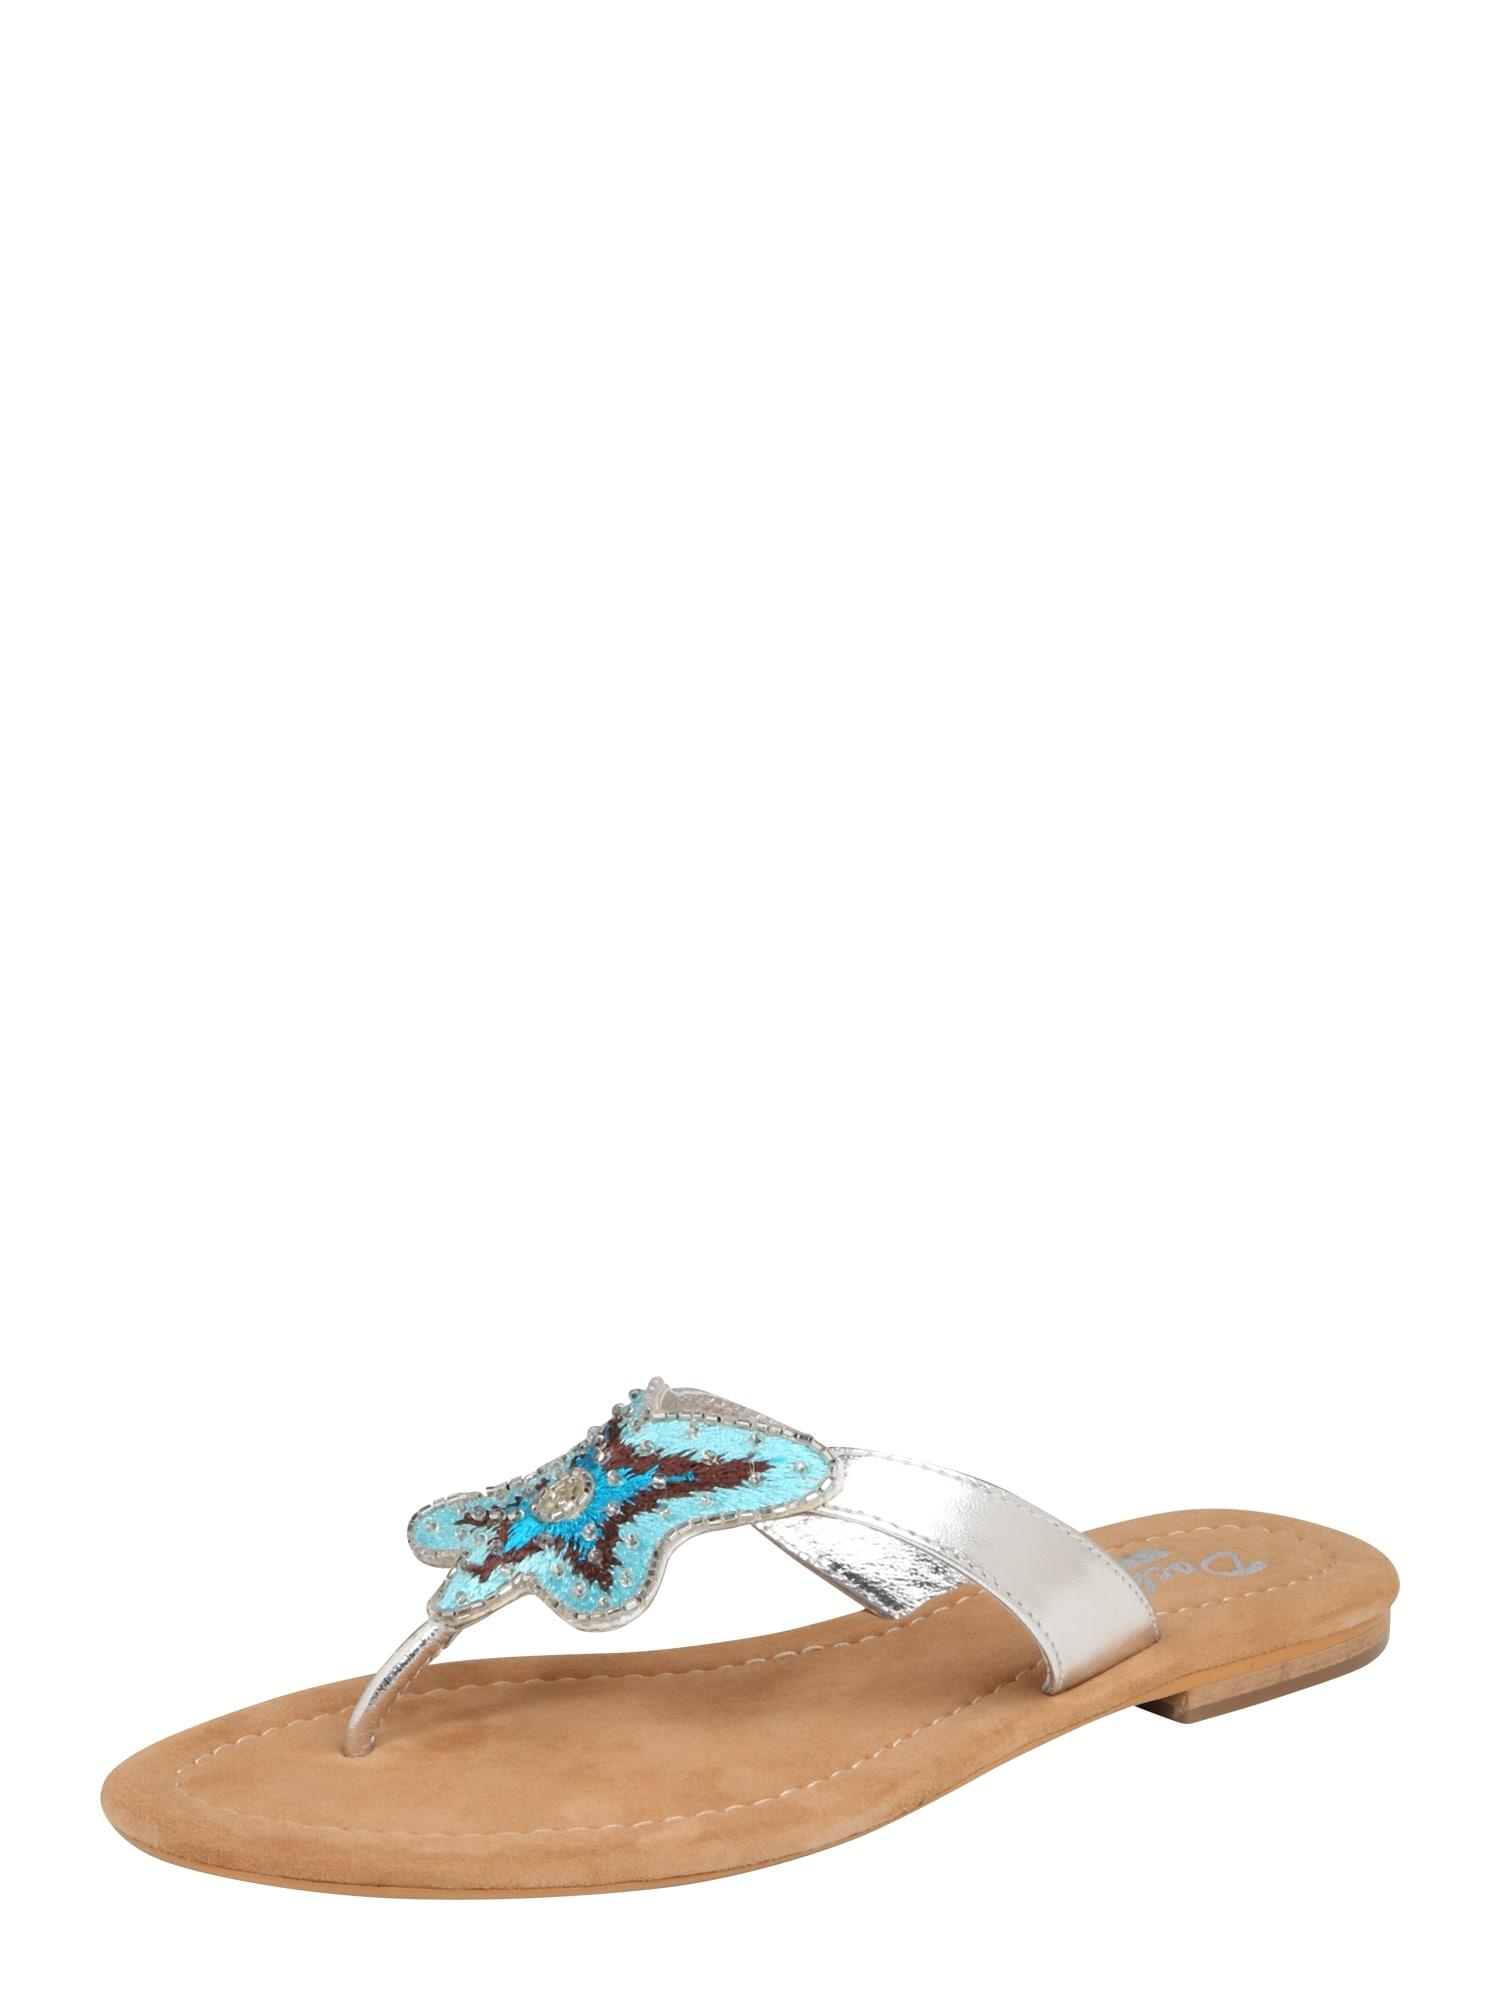 Pantofle béžová modrá stříbrná Dockers By Gerli